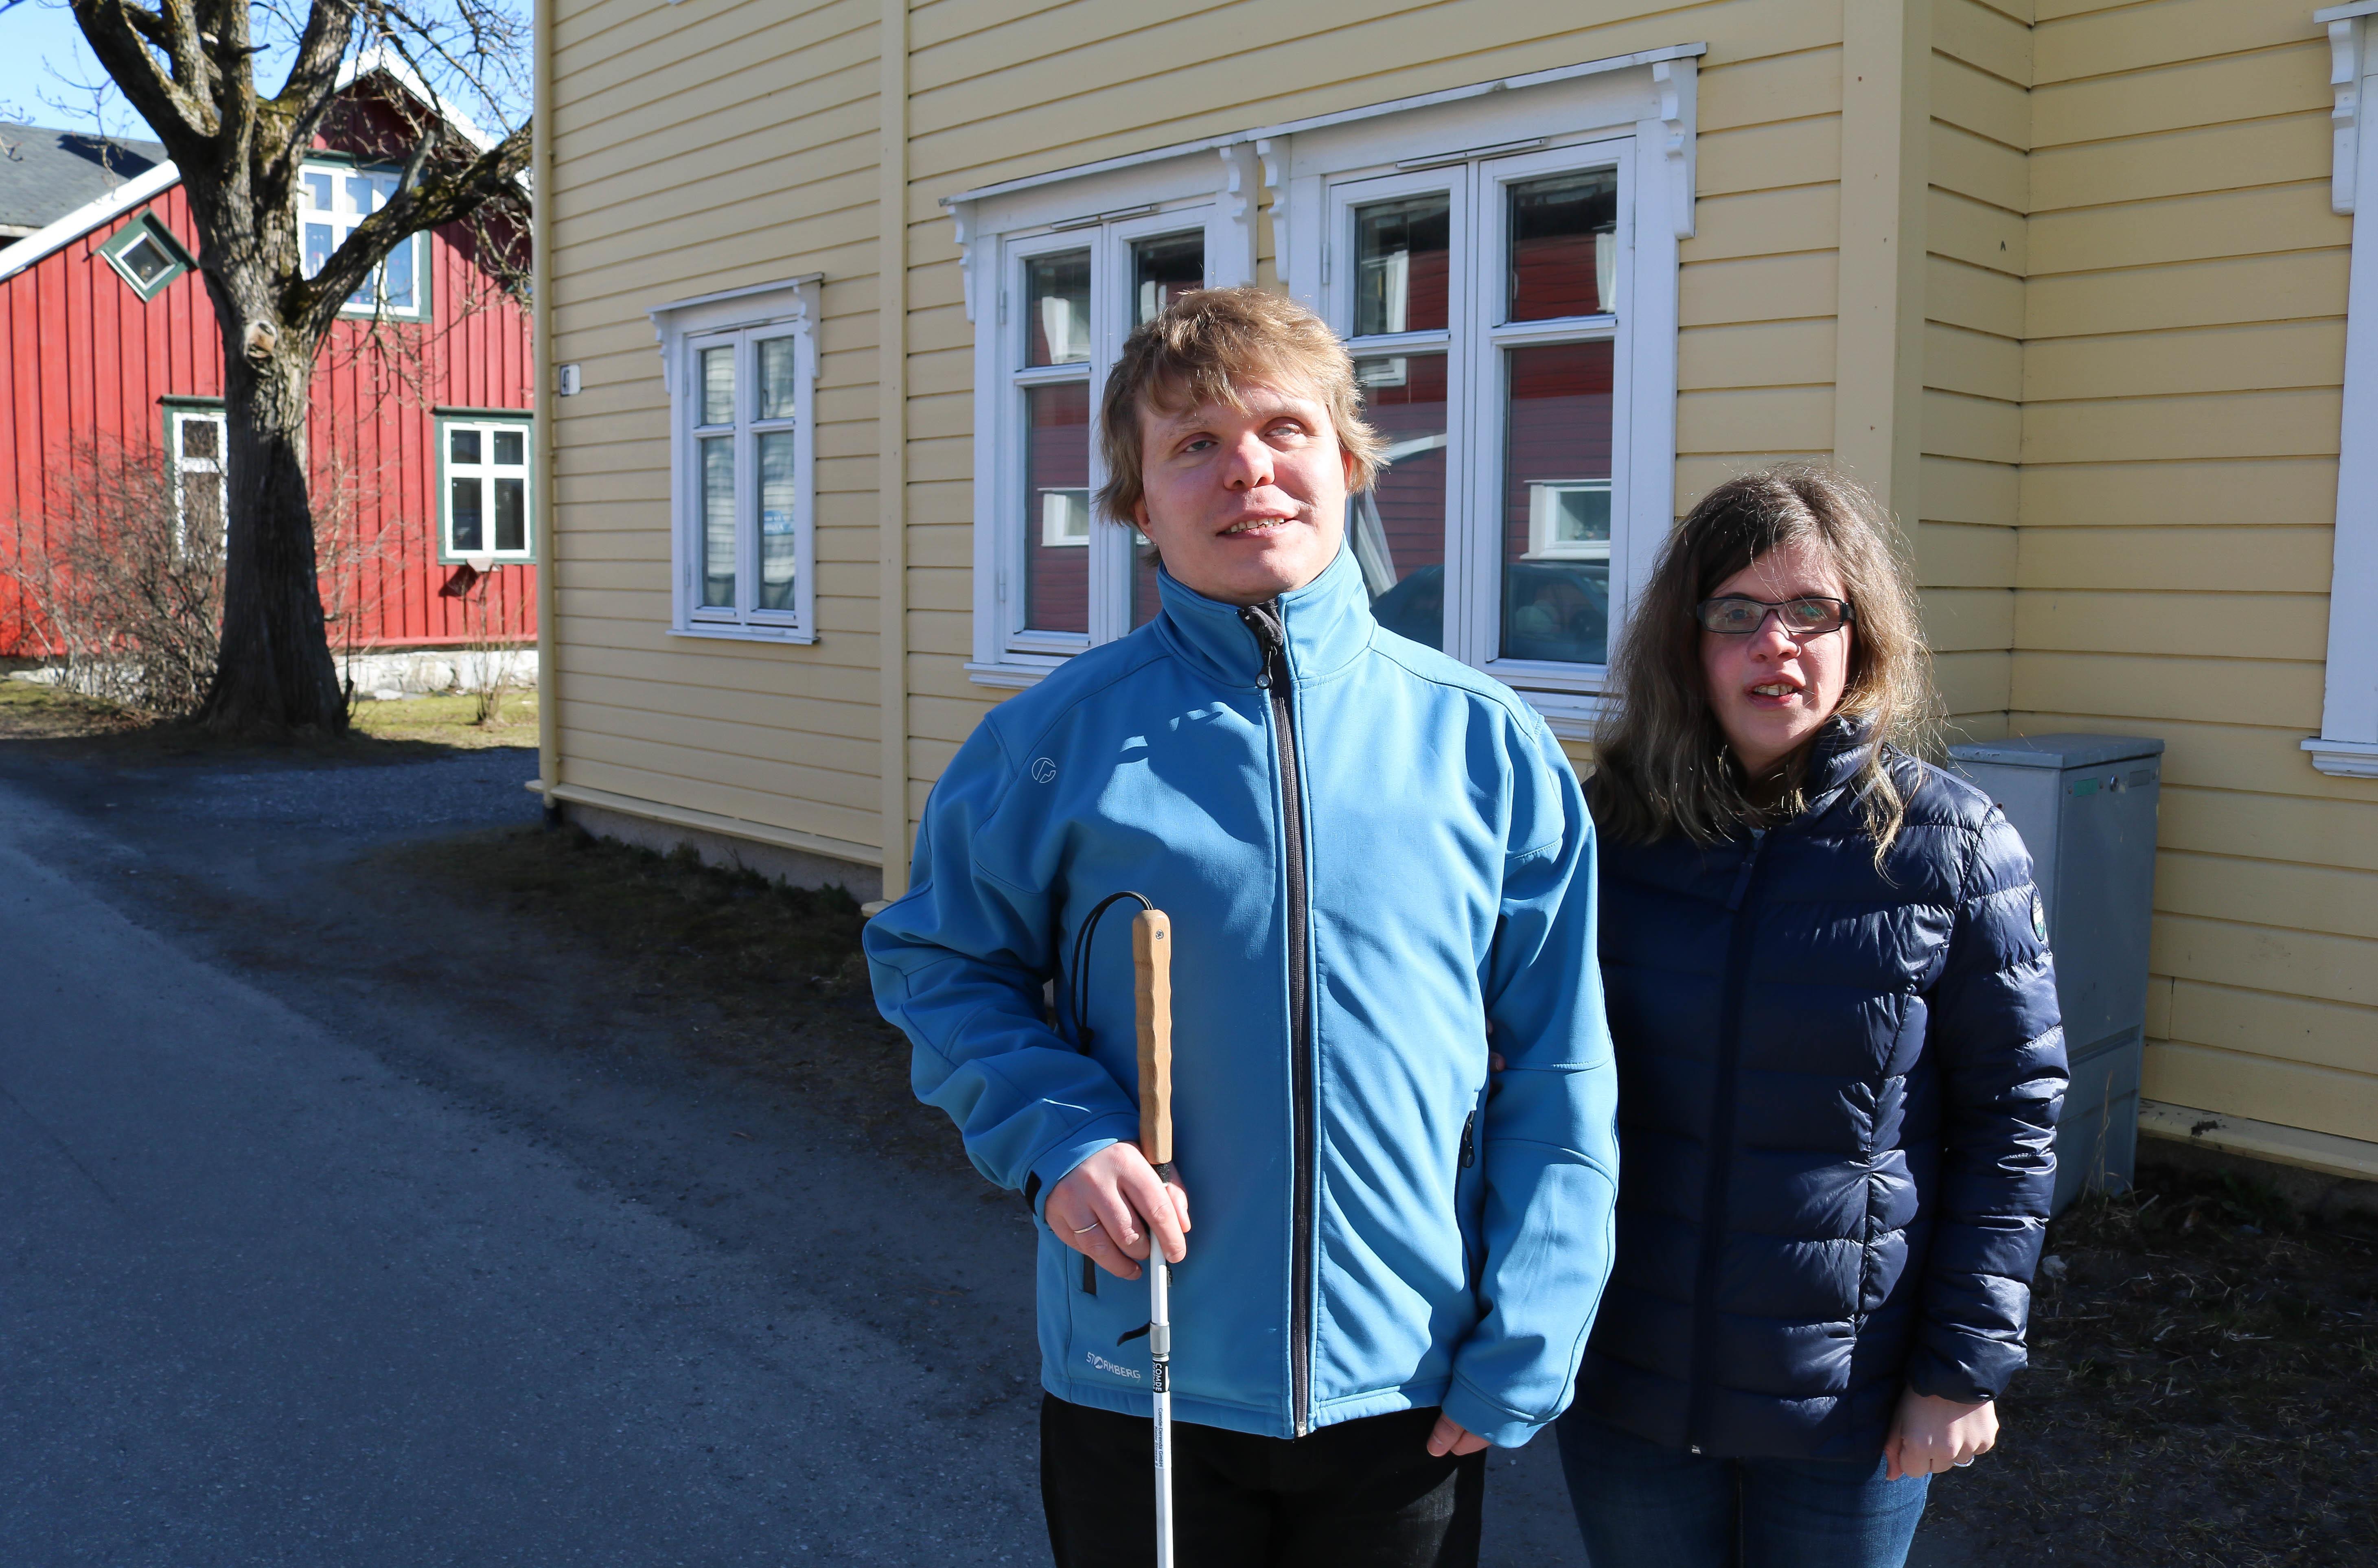 Døvblind mann med blindestokk og hans kone foran et gult hus.